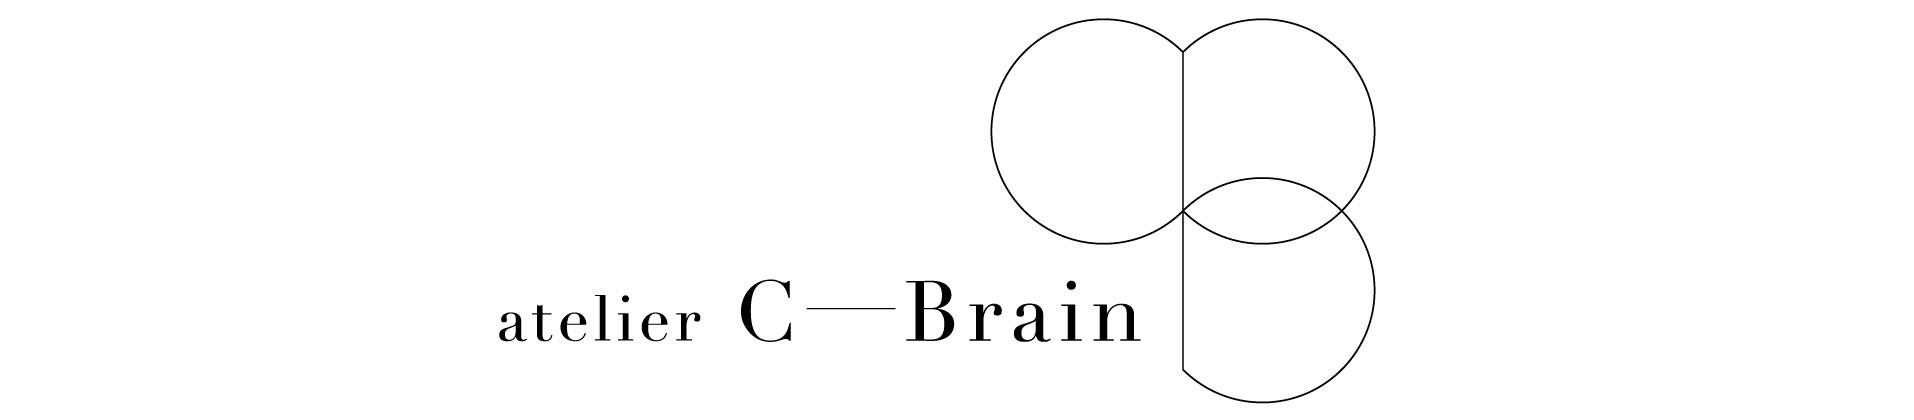 C-Brain シーブレーン    手作り ・ ハンドメイド 腕時計【公式】